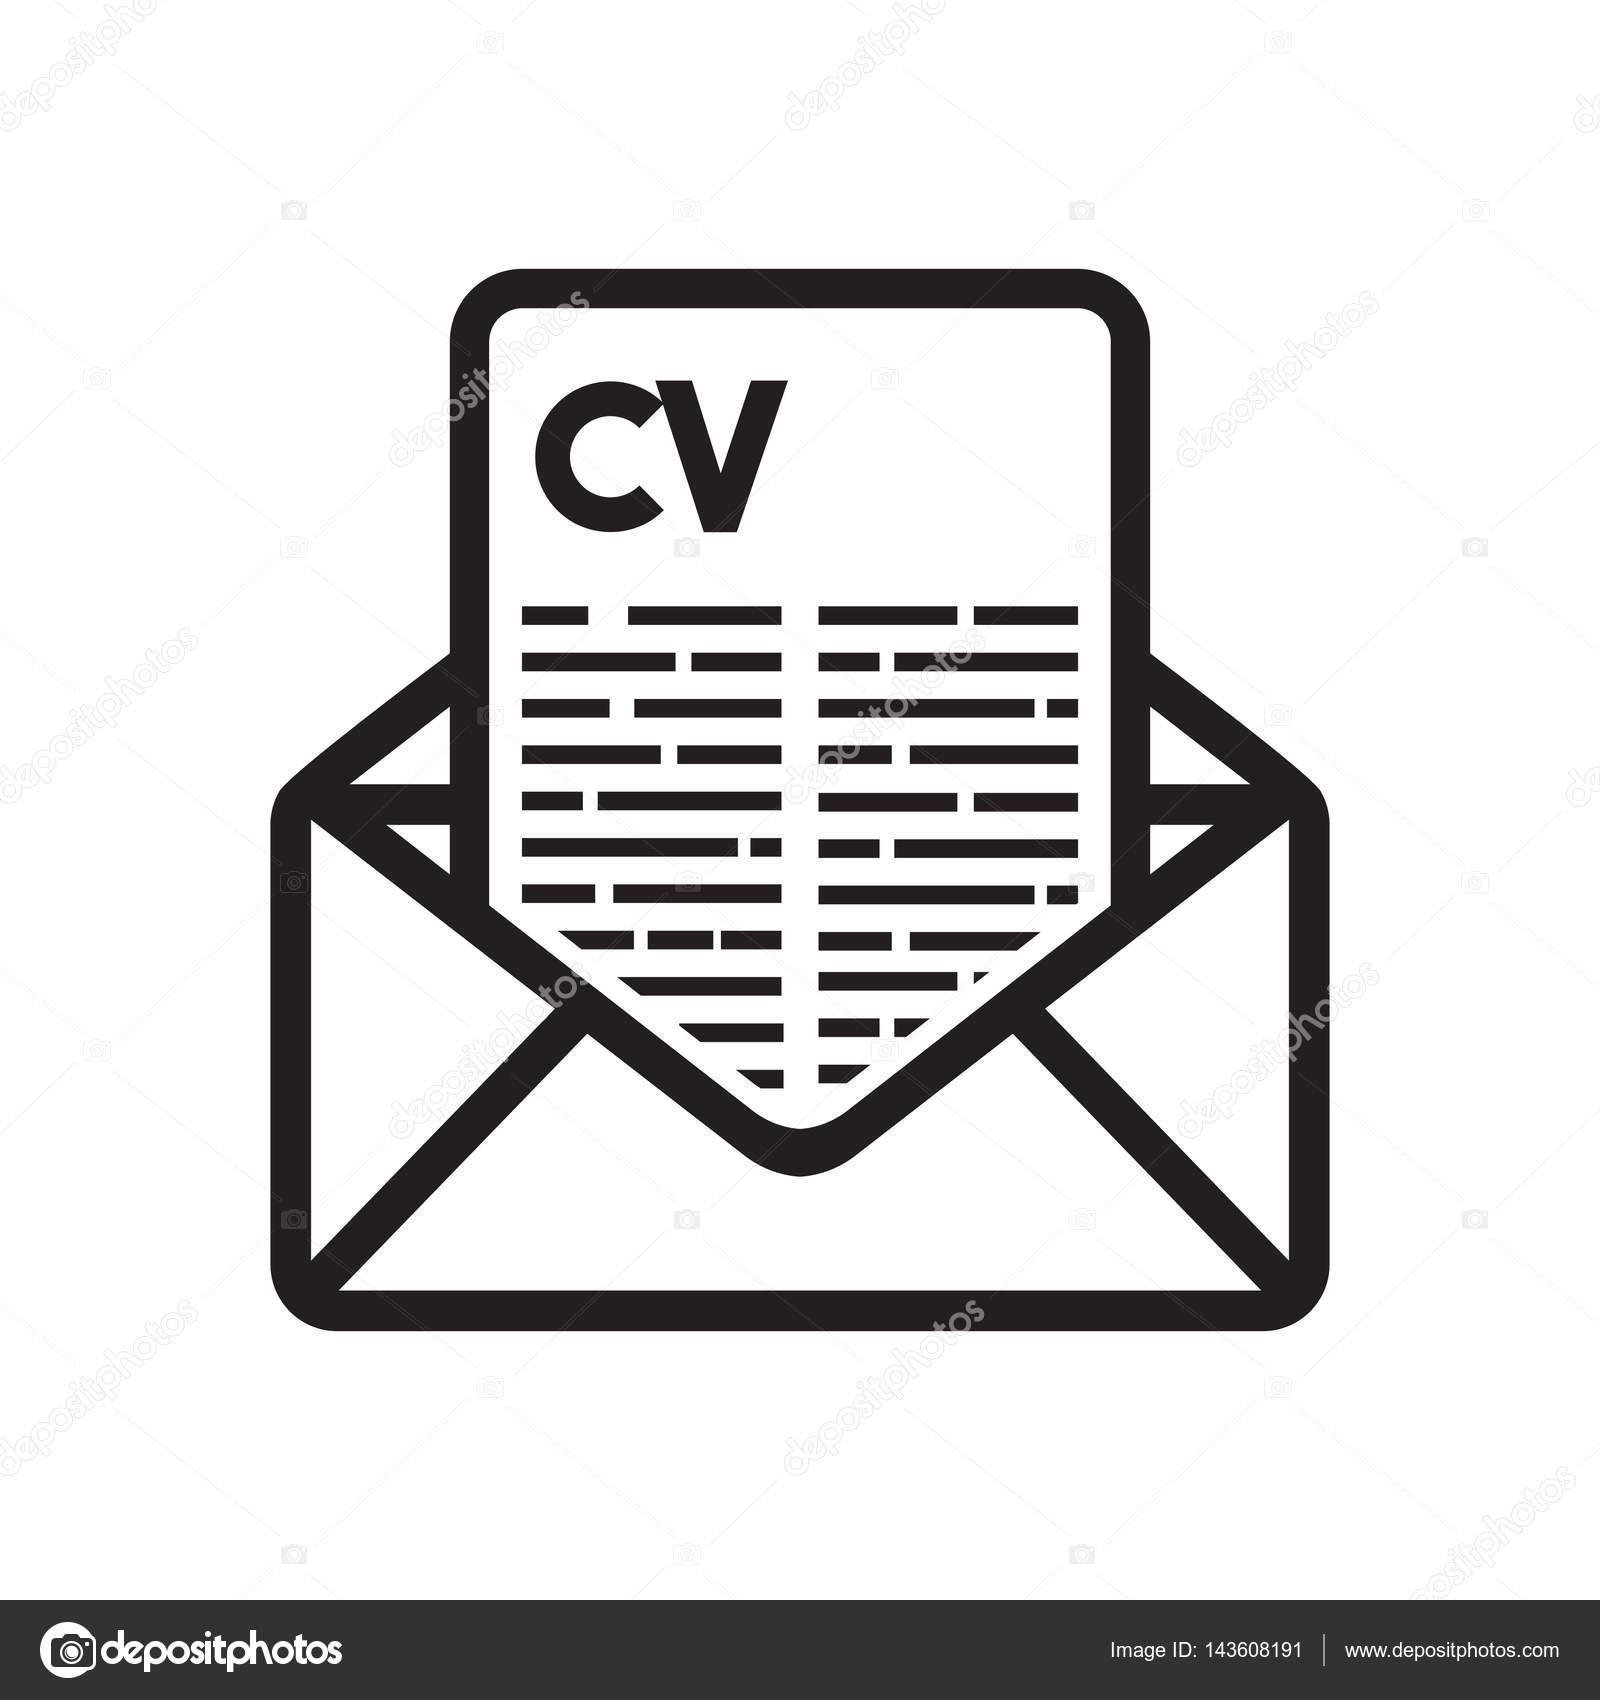 Concept D Envoyer Cv Image Vectorielle Branchecarica C 143608191